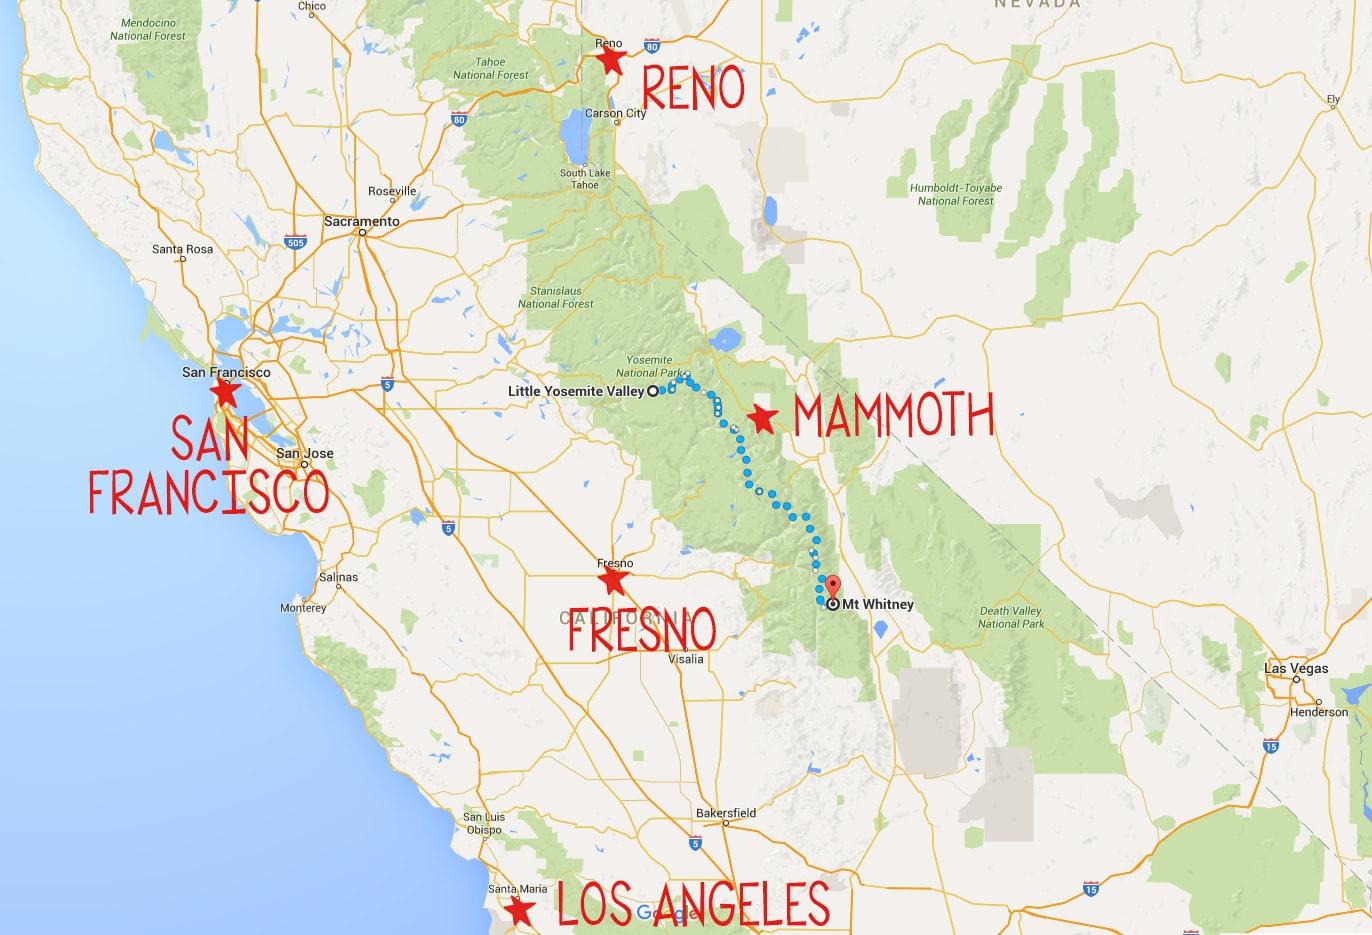 john muir wilderness map pdf